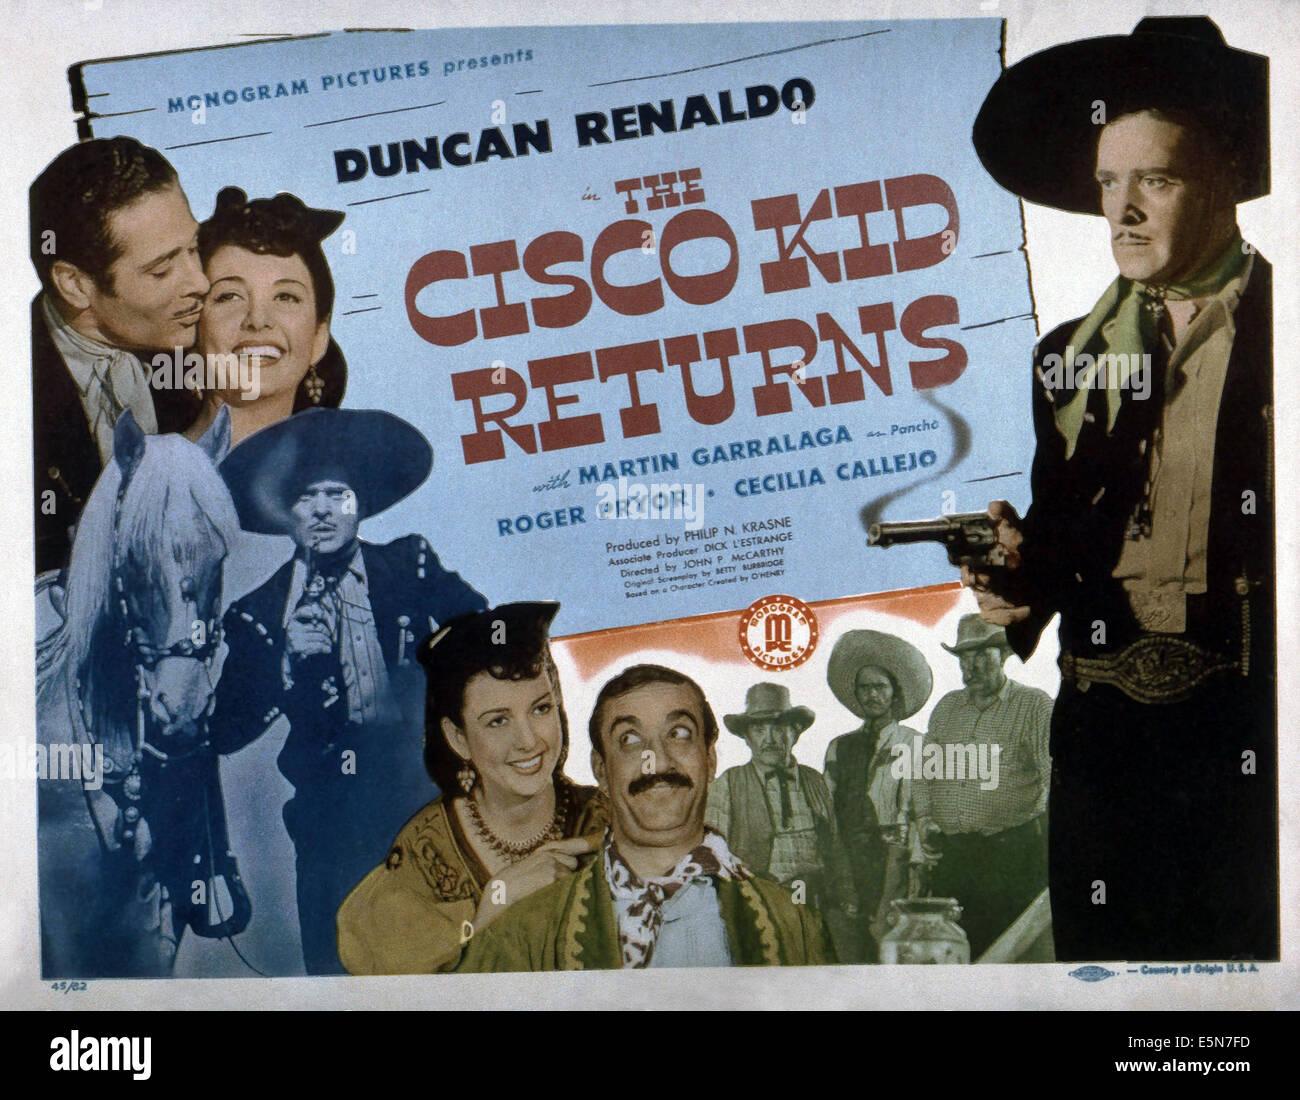 THE CISCO KID RETURNS From Left Duncan Renaldo Cecilia Callejo